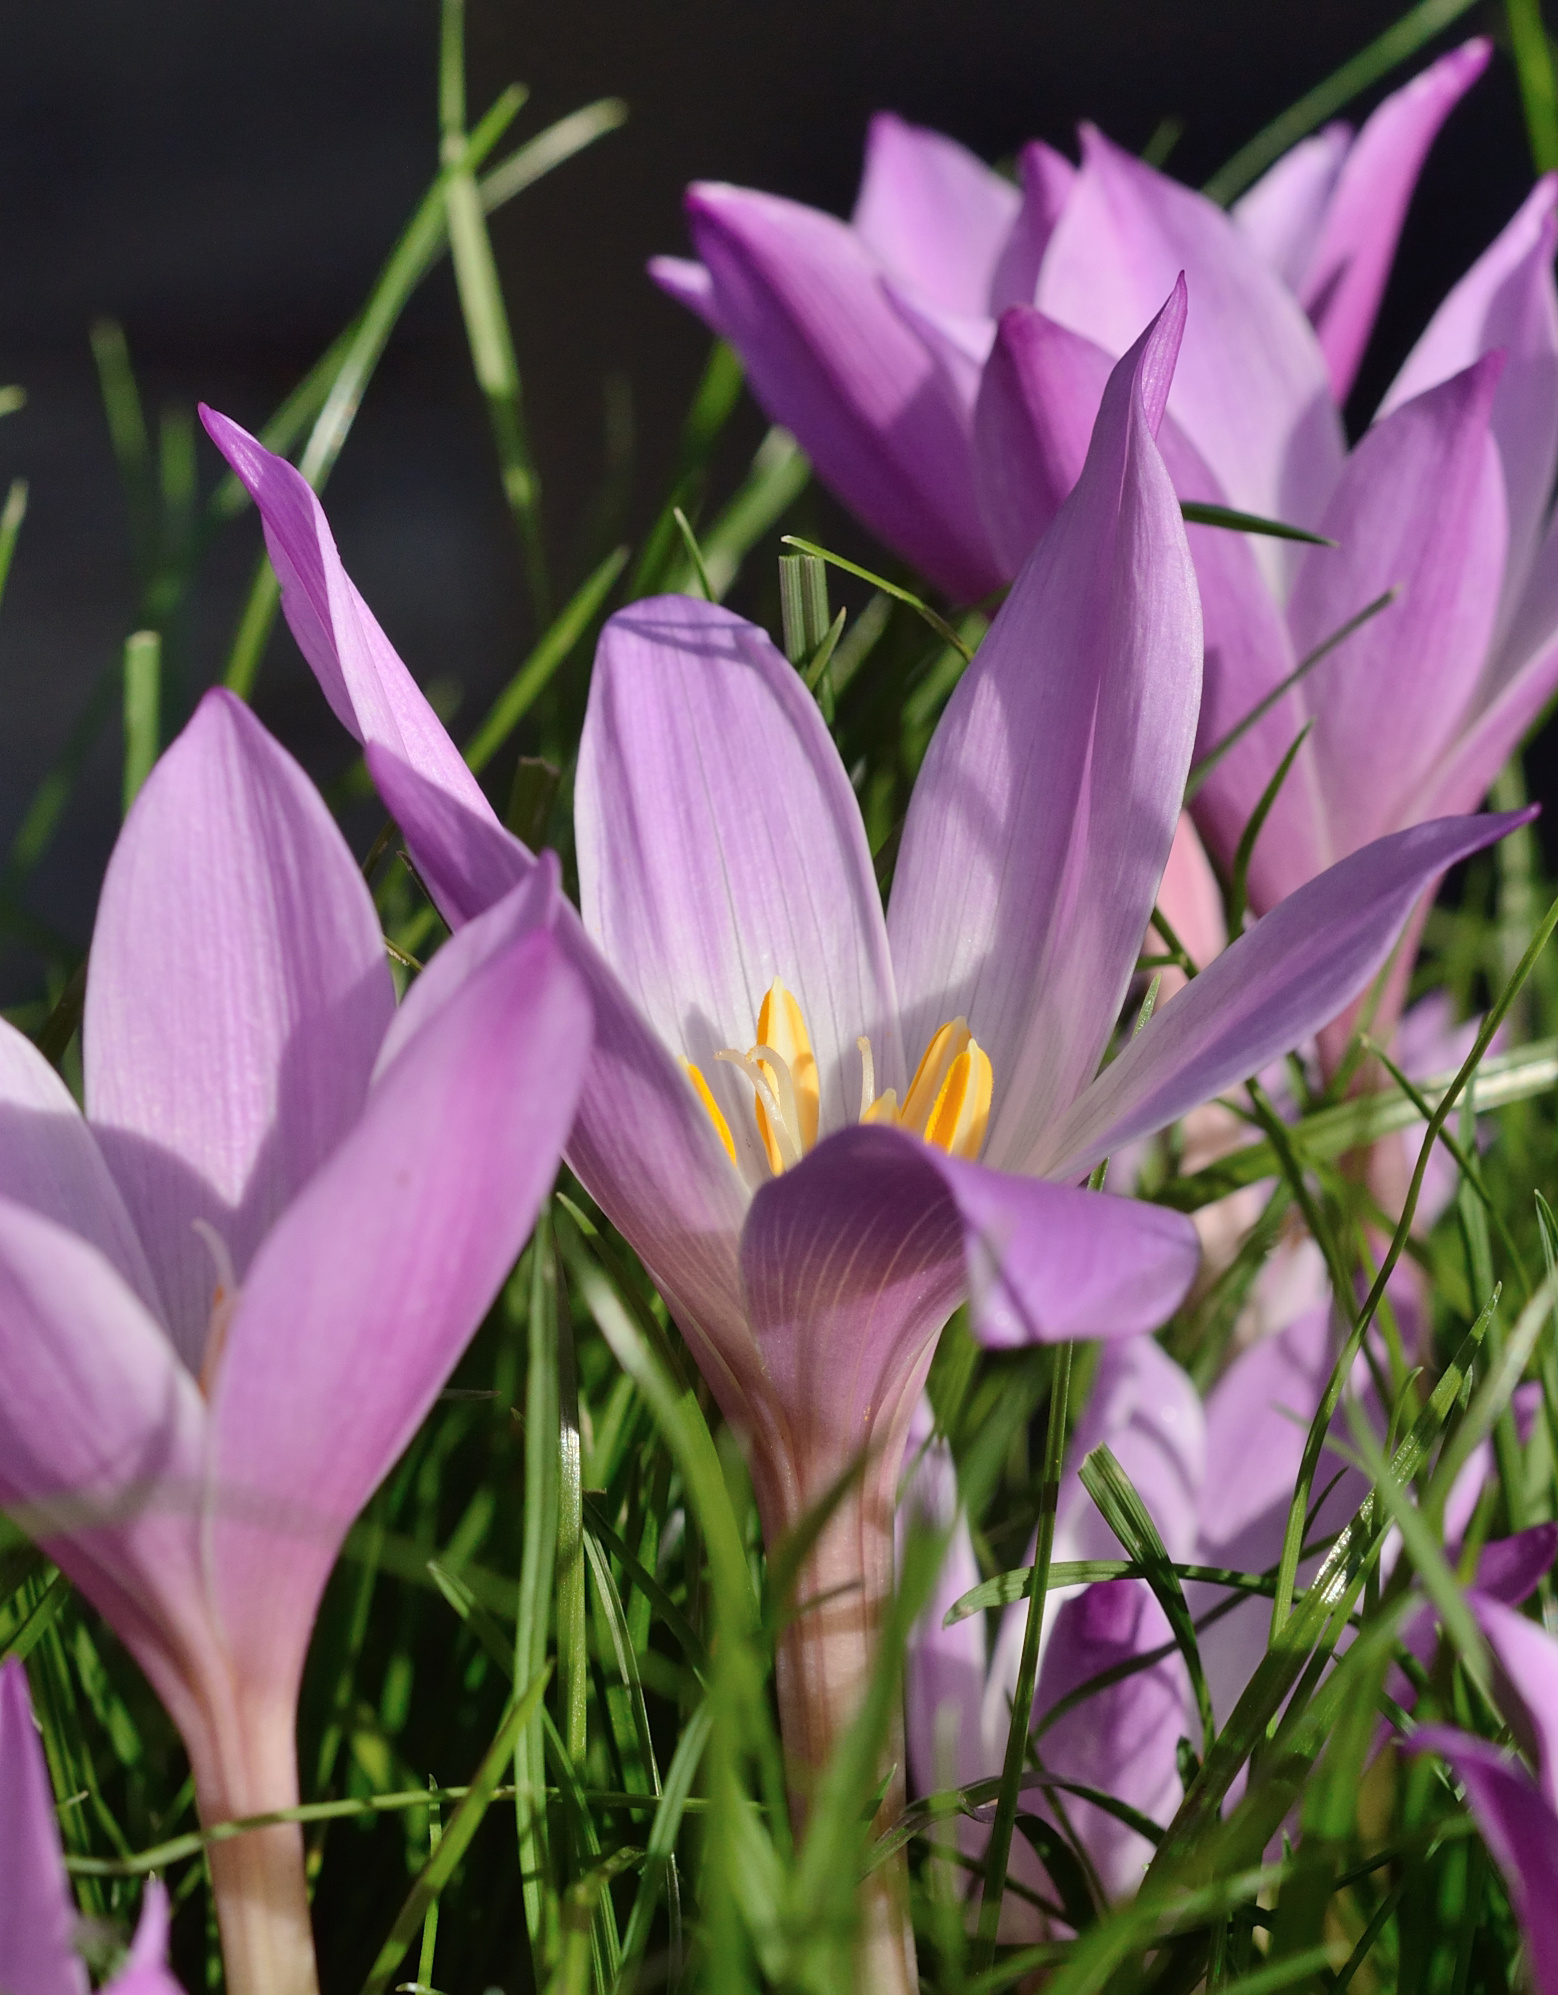 Herfsttijloos Colchicum speciosum (Herfsttijloos)